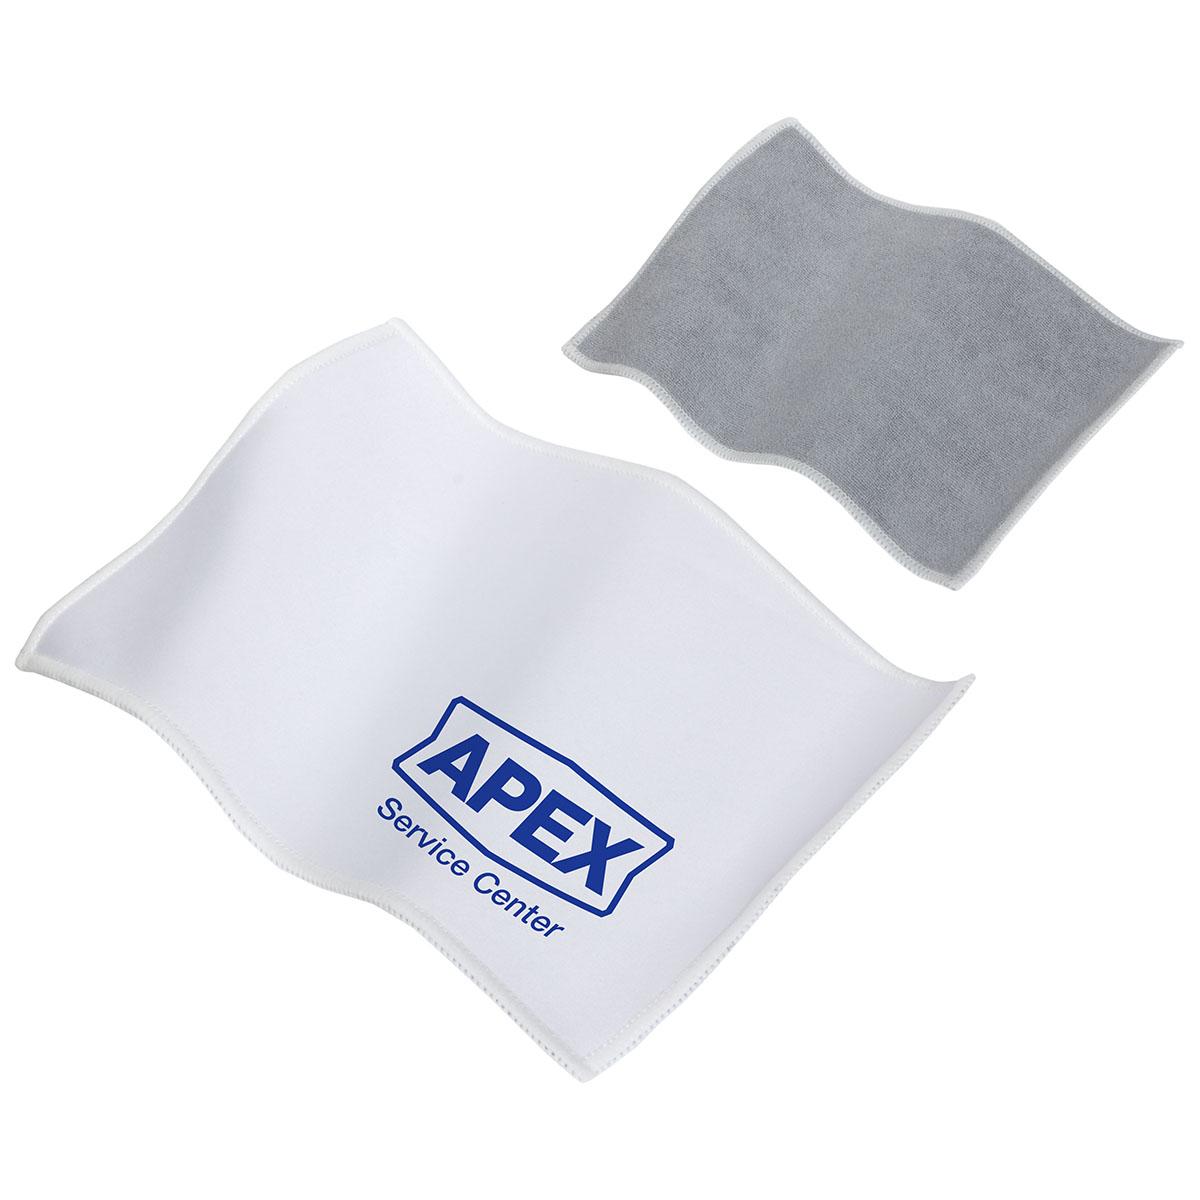 Quick Clean Dual Sided Microfiber Cloth, WPC-QC13 - 1 Colour Imprint